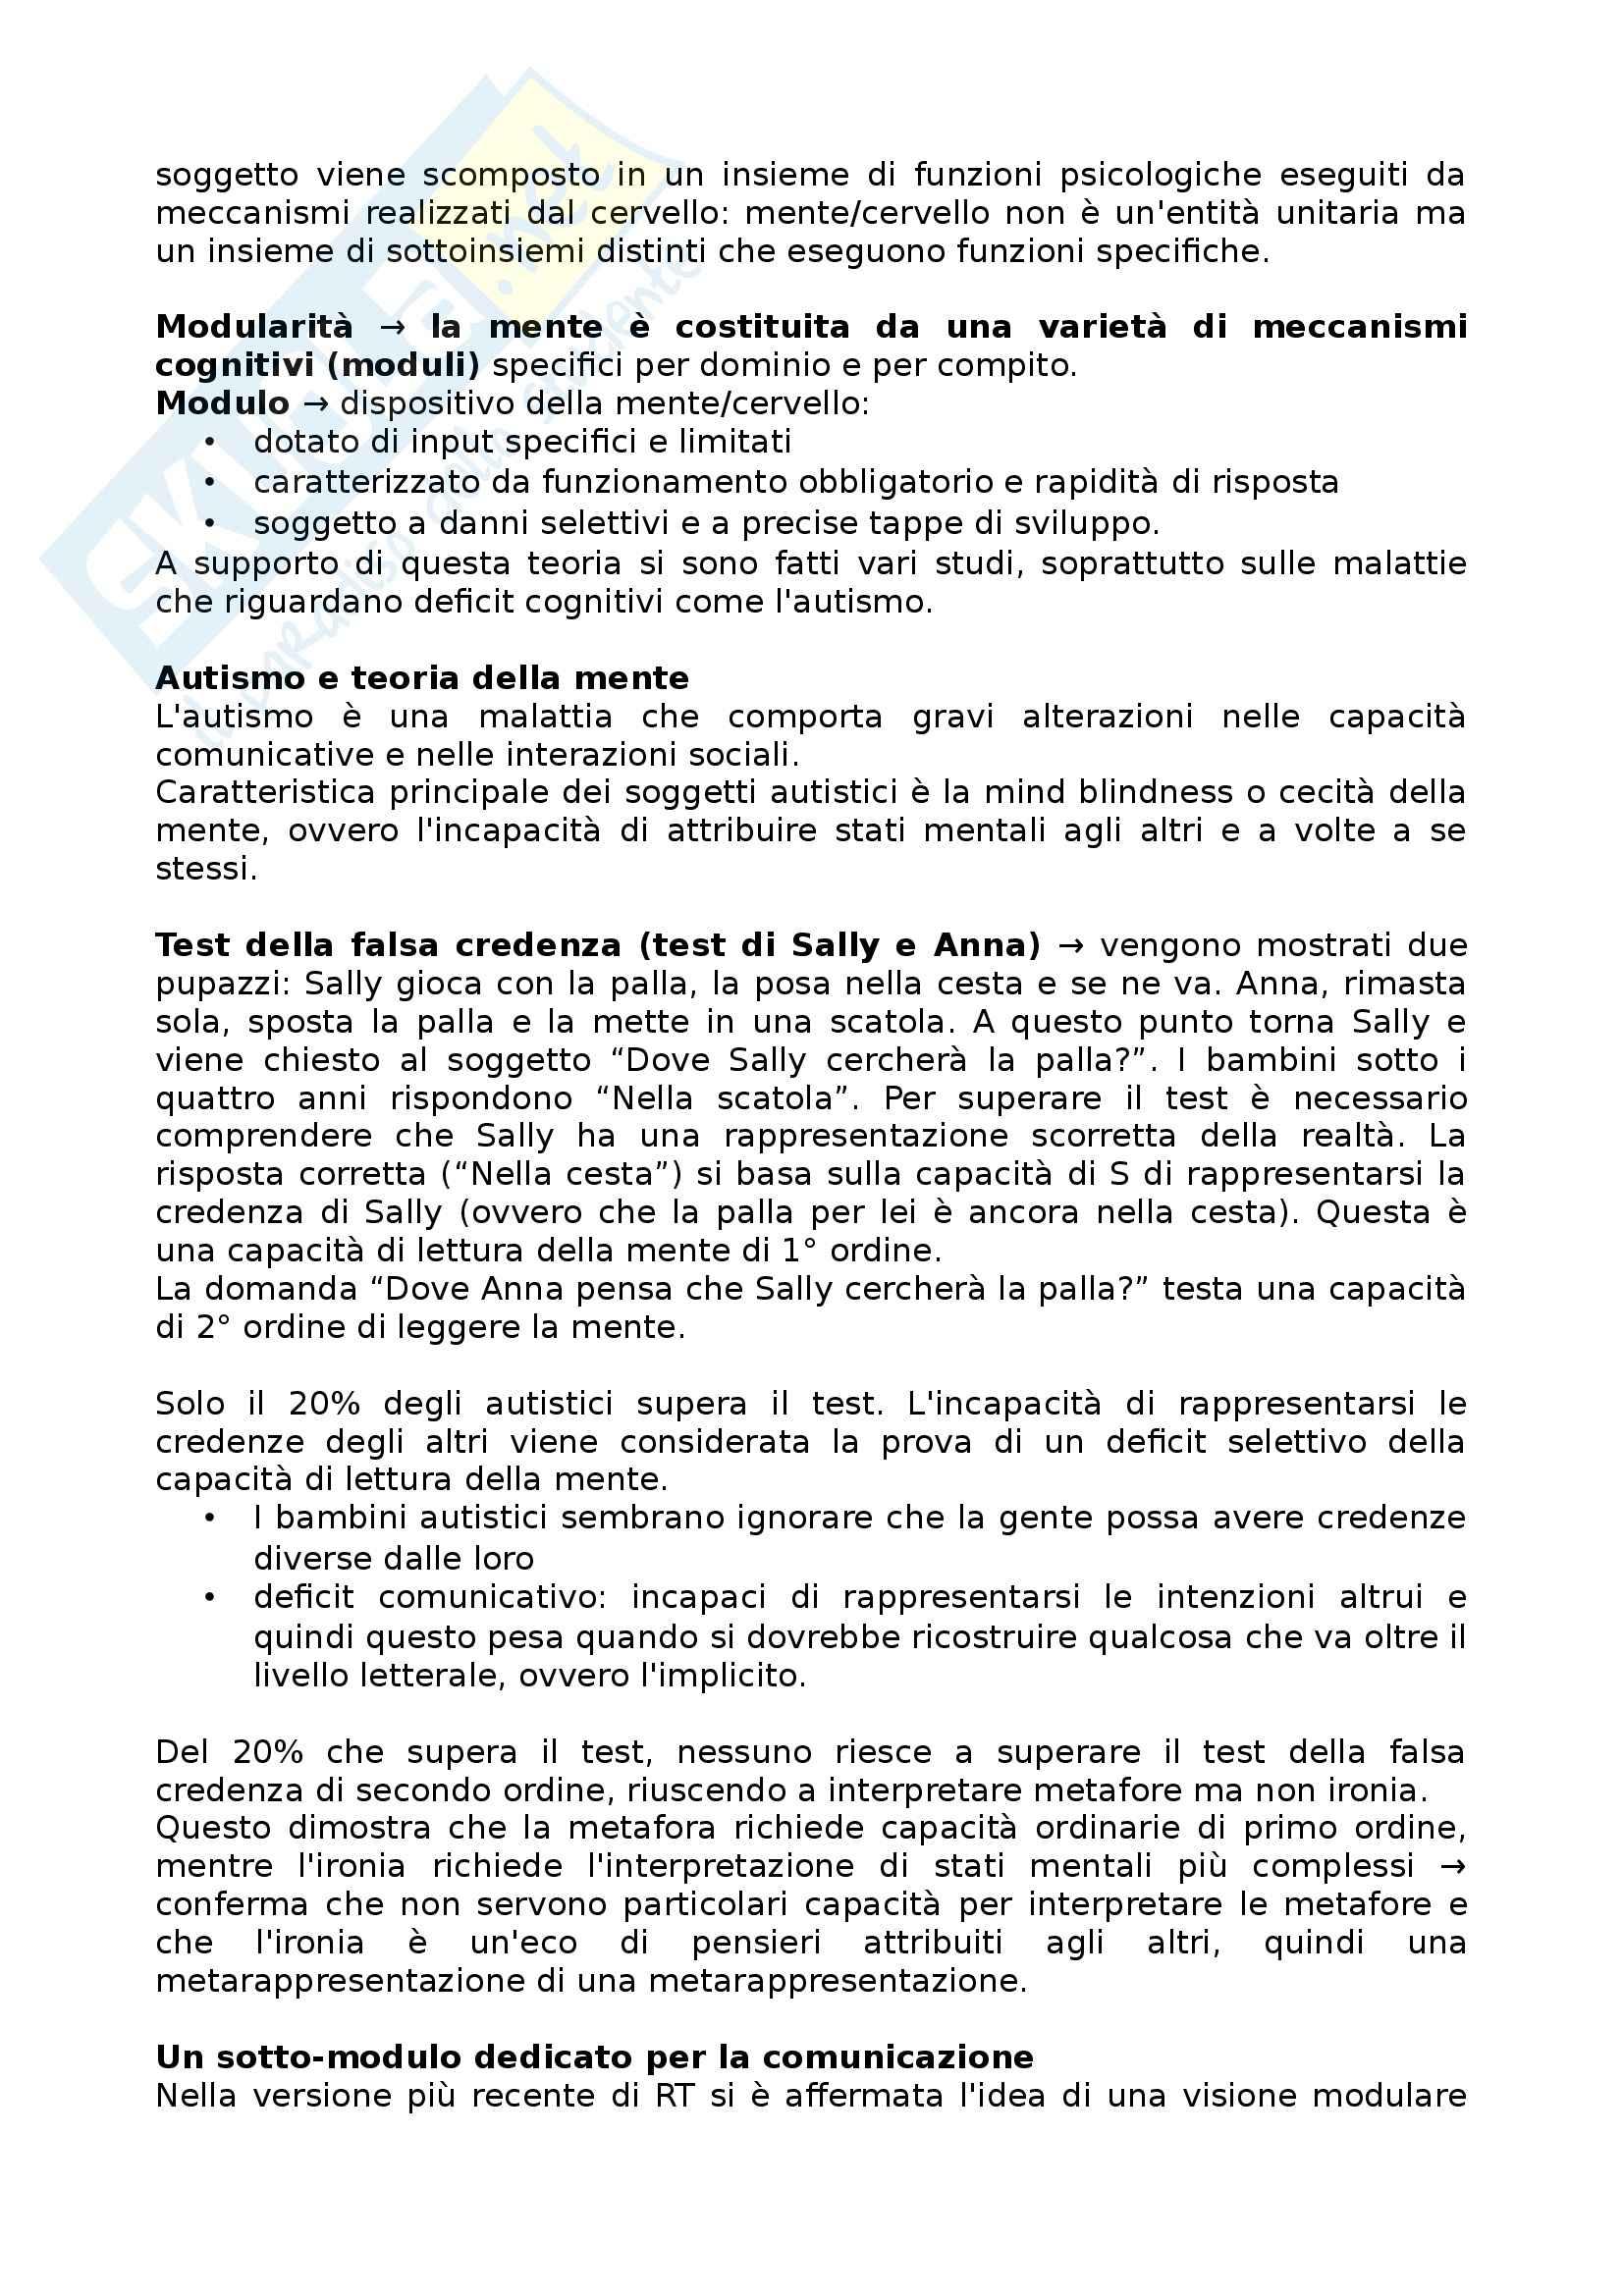 Riassunto esame Semiotica, prof. Calabi, libro consigliato Pragmatica Cognitiva, Bianchi Pag. 21